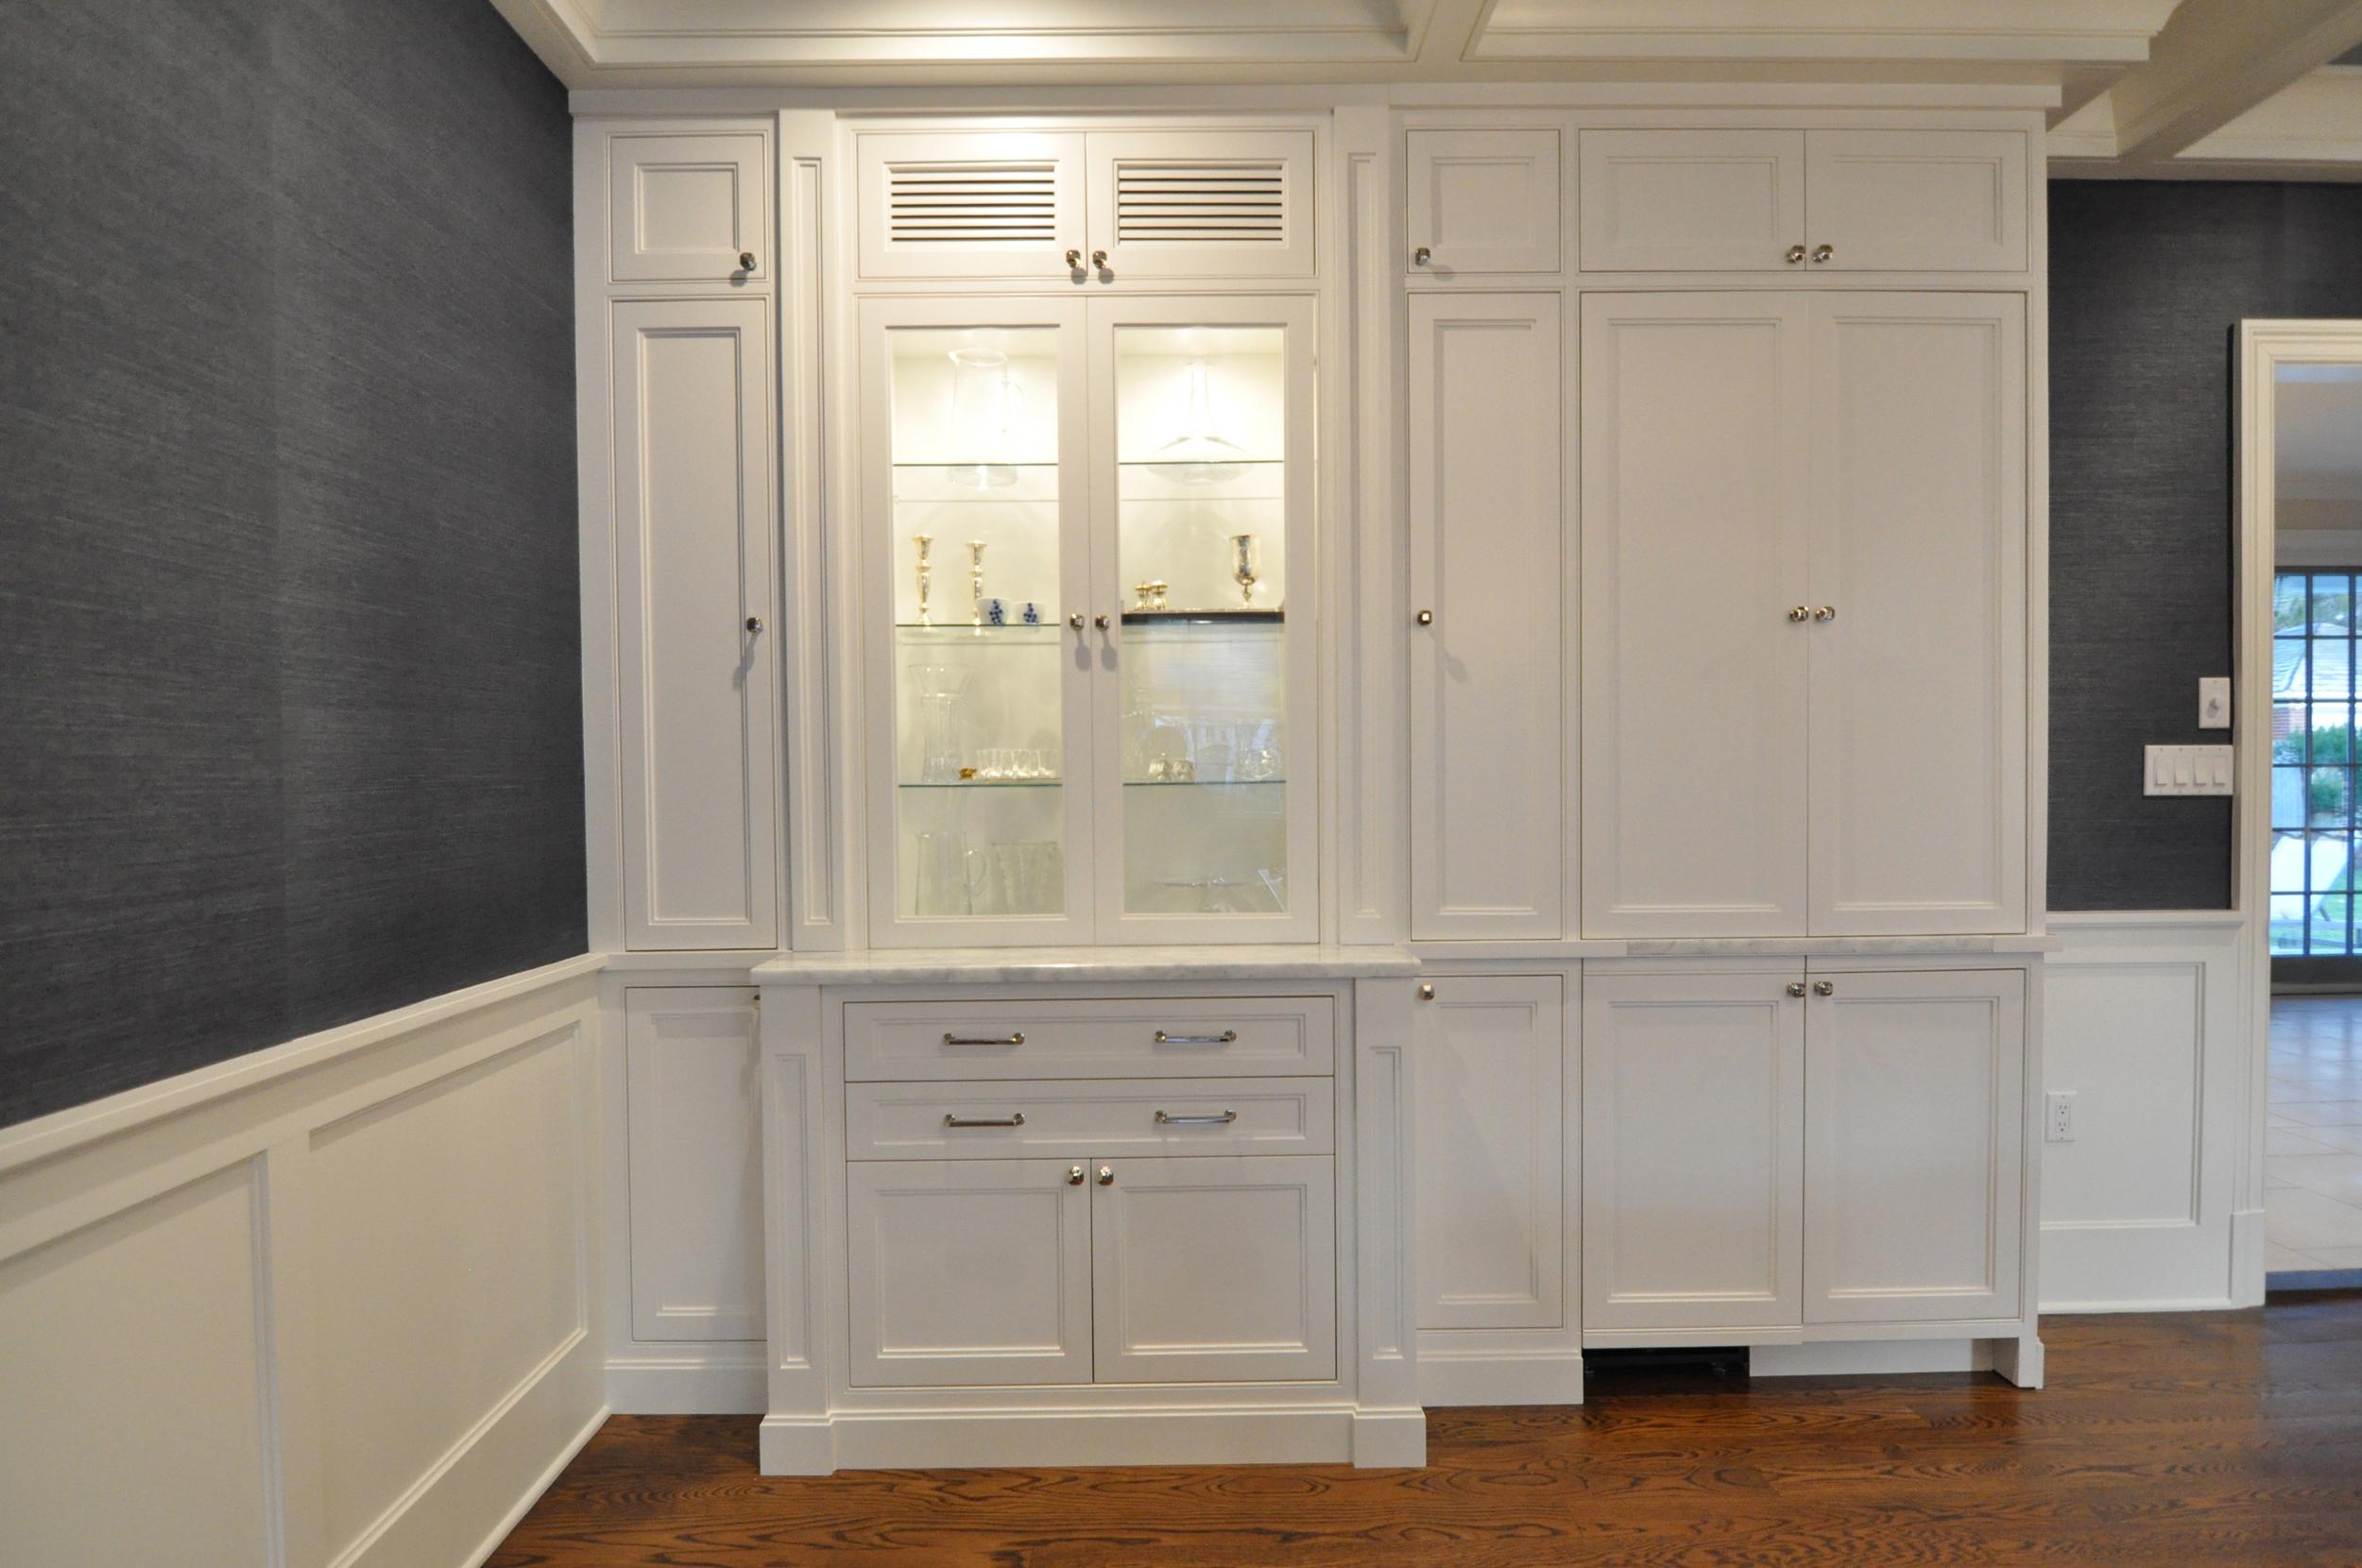 Dining KAM DESIGN_Dining Room Millwork_White Custom Cabinet_Wet Bar Closed_Wainscot - 1.jpg